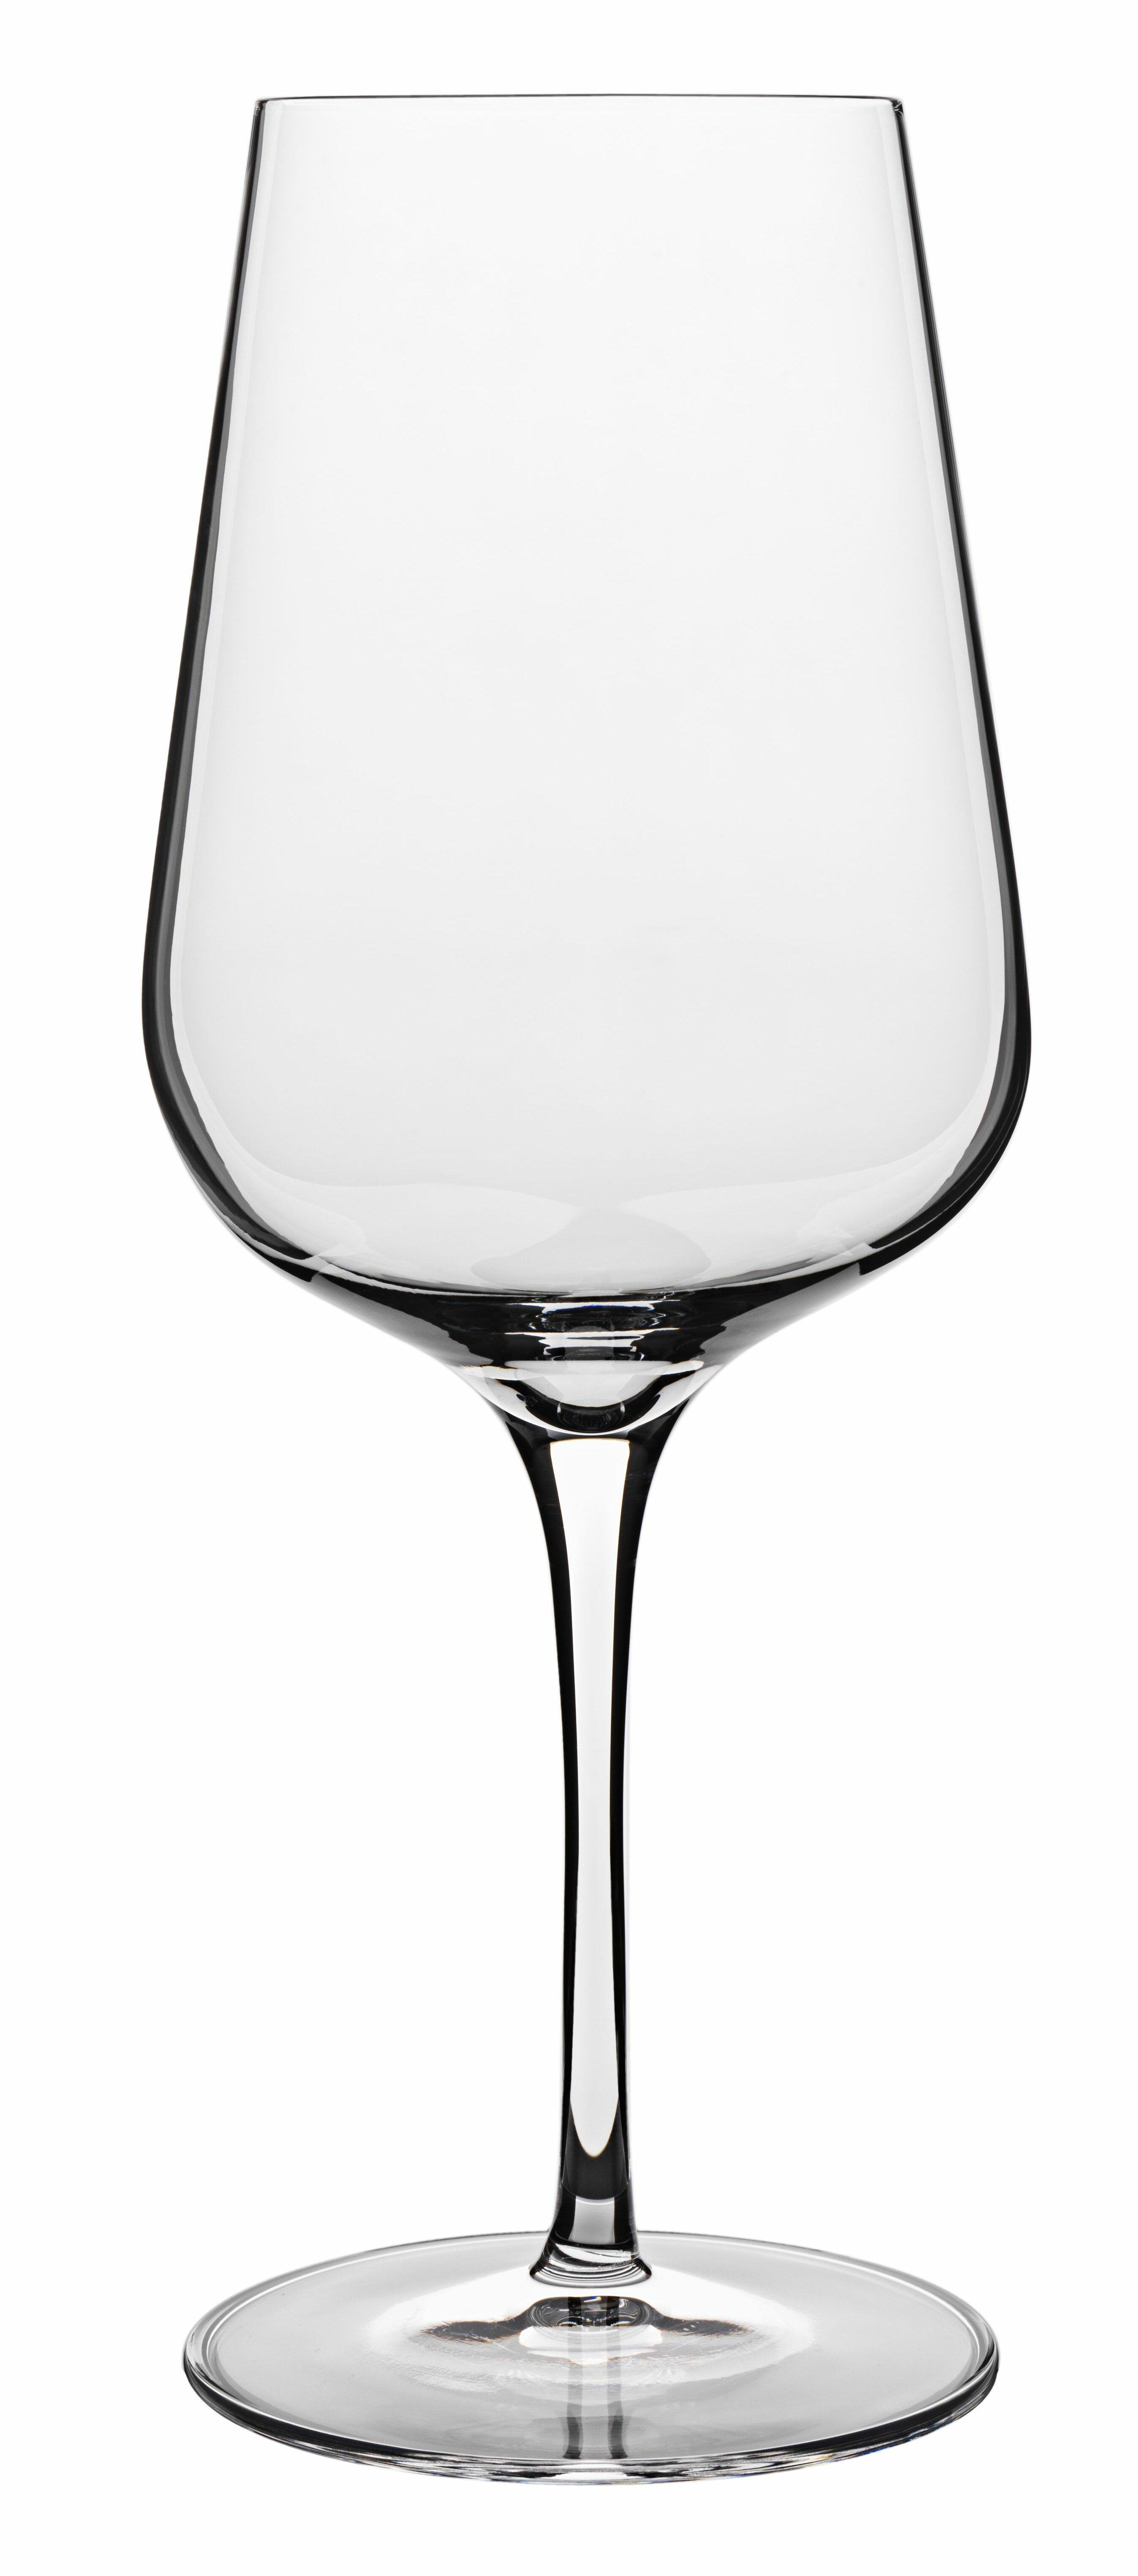 Luigi Bormioli Intenso 550 19 Oz Glass Stemmed Wine Glass Reviews Wayfair Ca